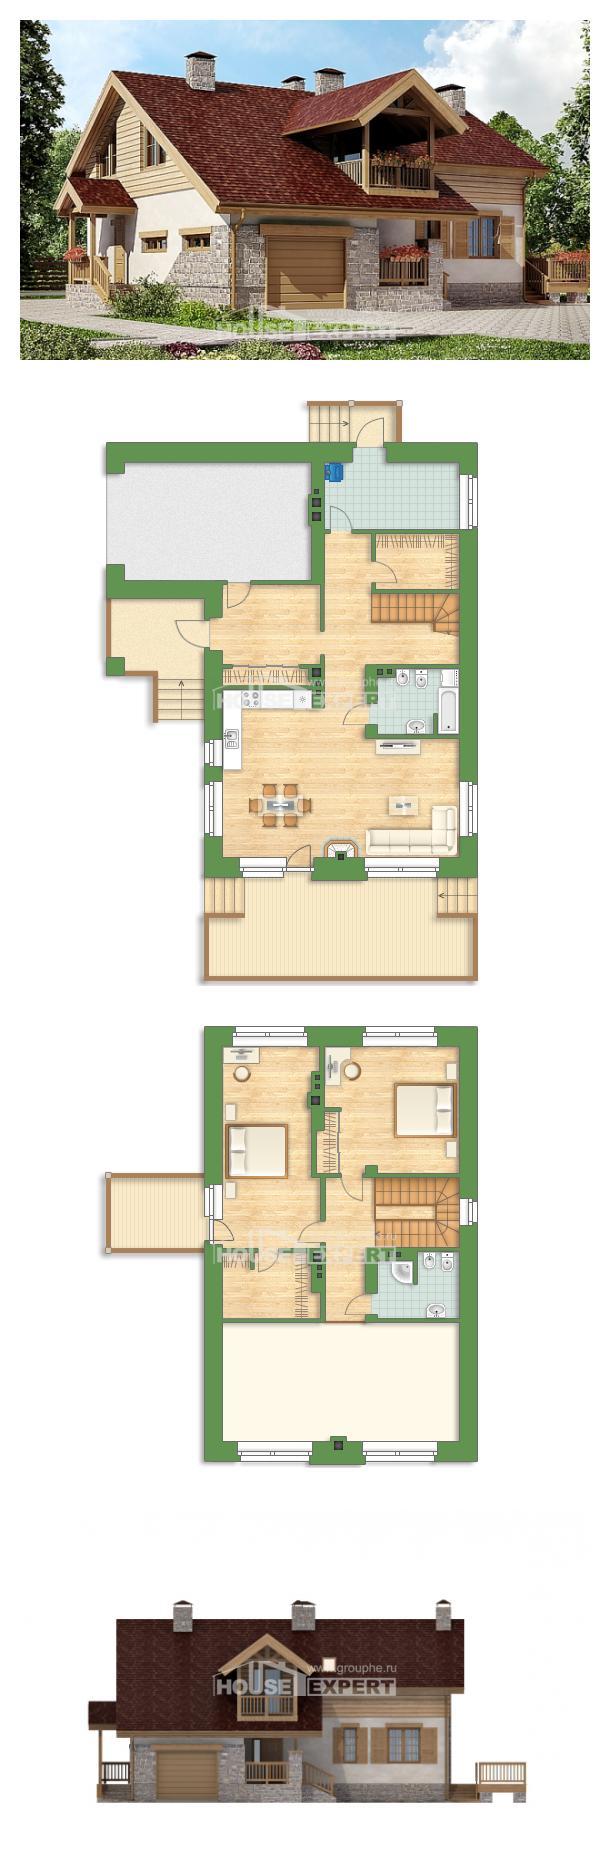 Projekt domu 165-002-R | House Expert